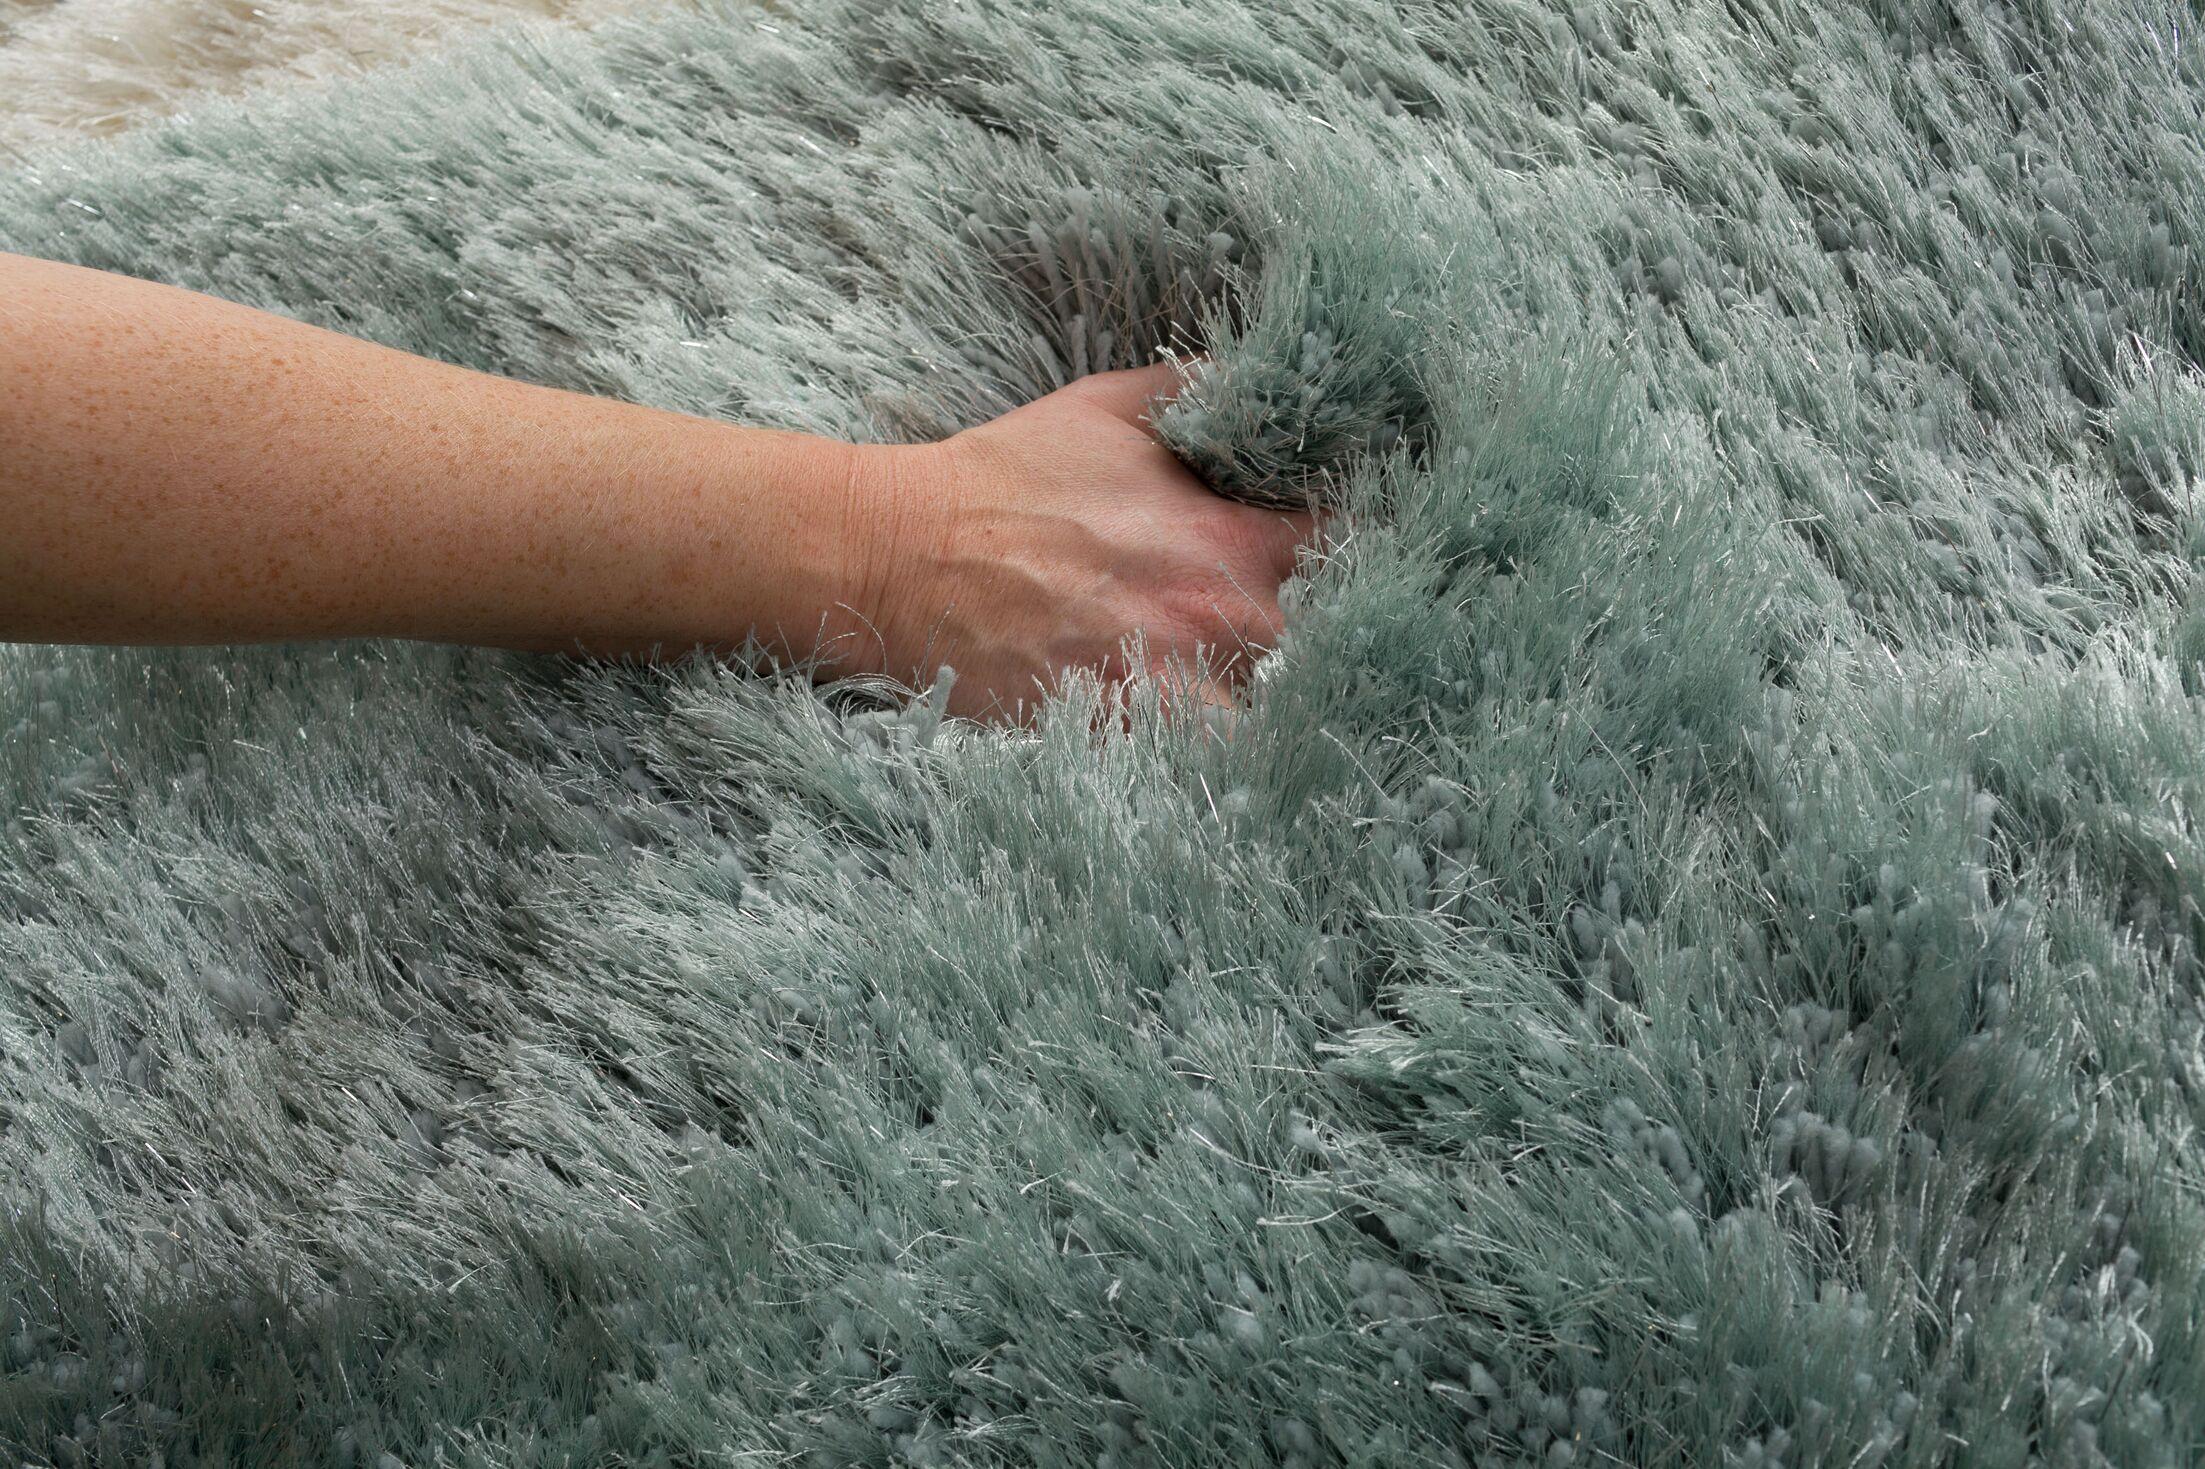 Somerville Hand-Tufted Aqua Area Rug Rug Size: 5' x 7'6